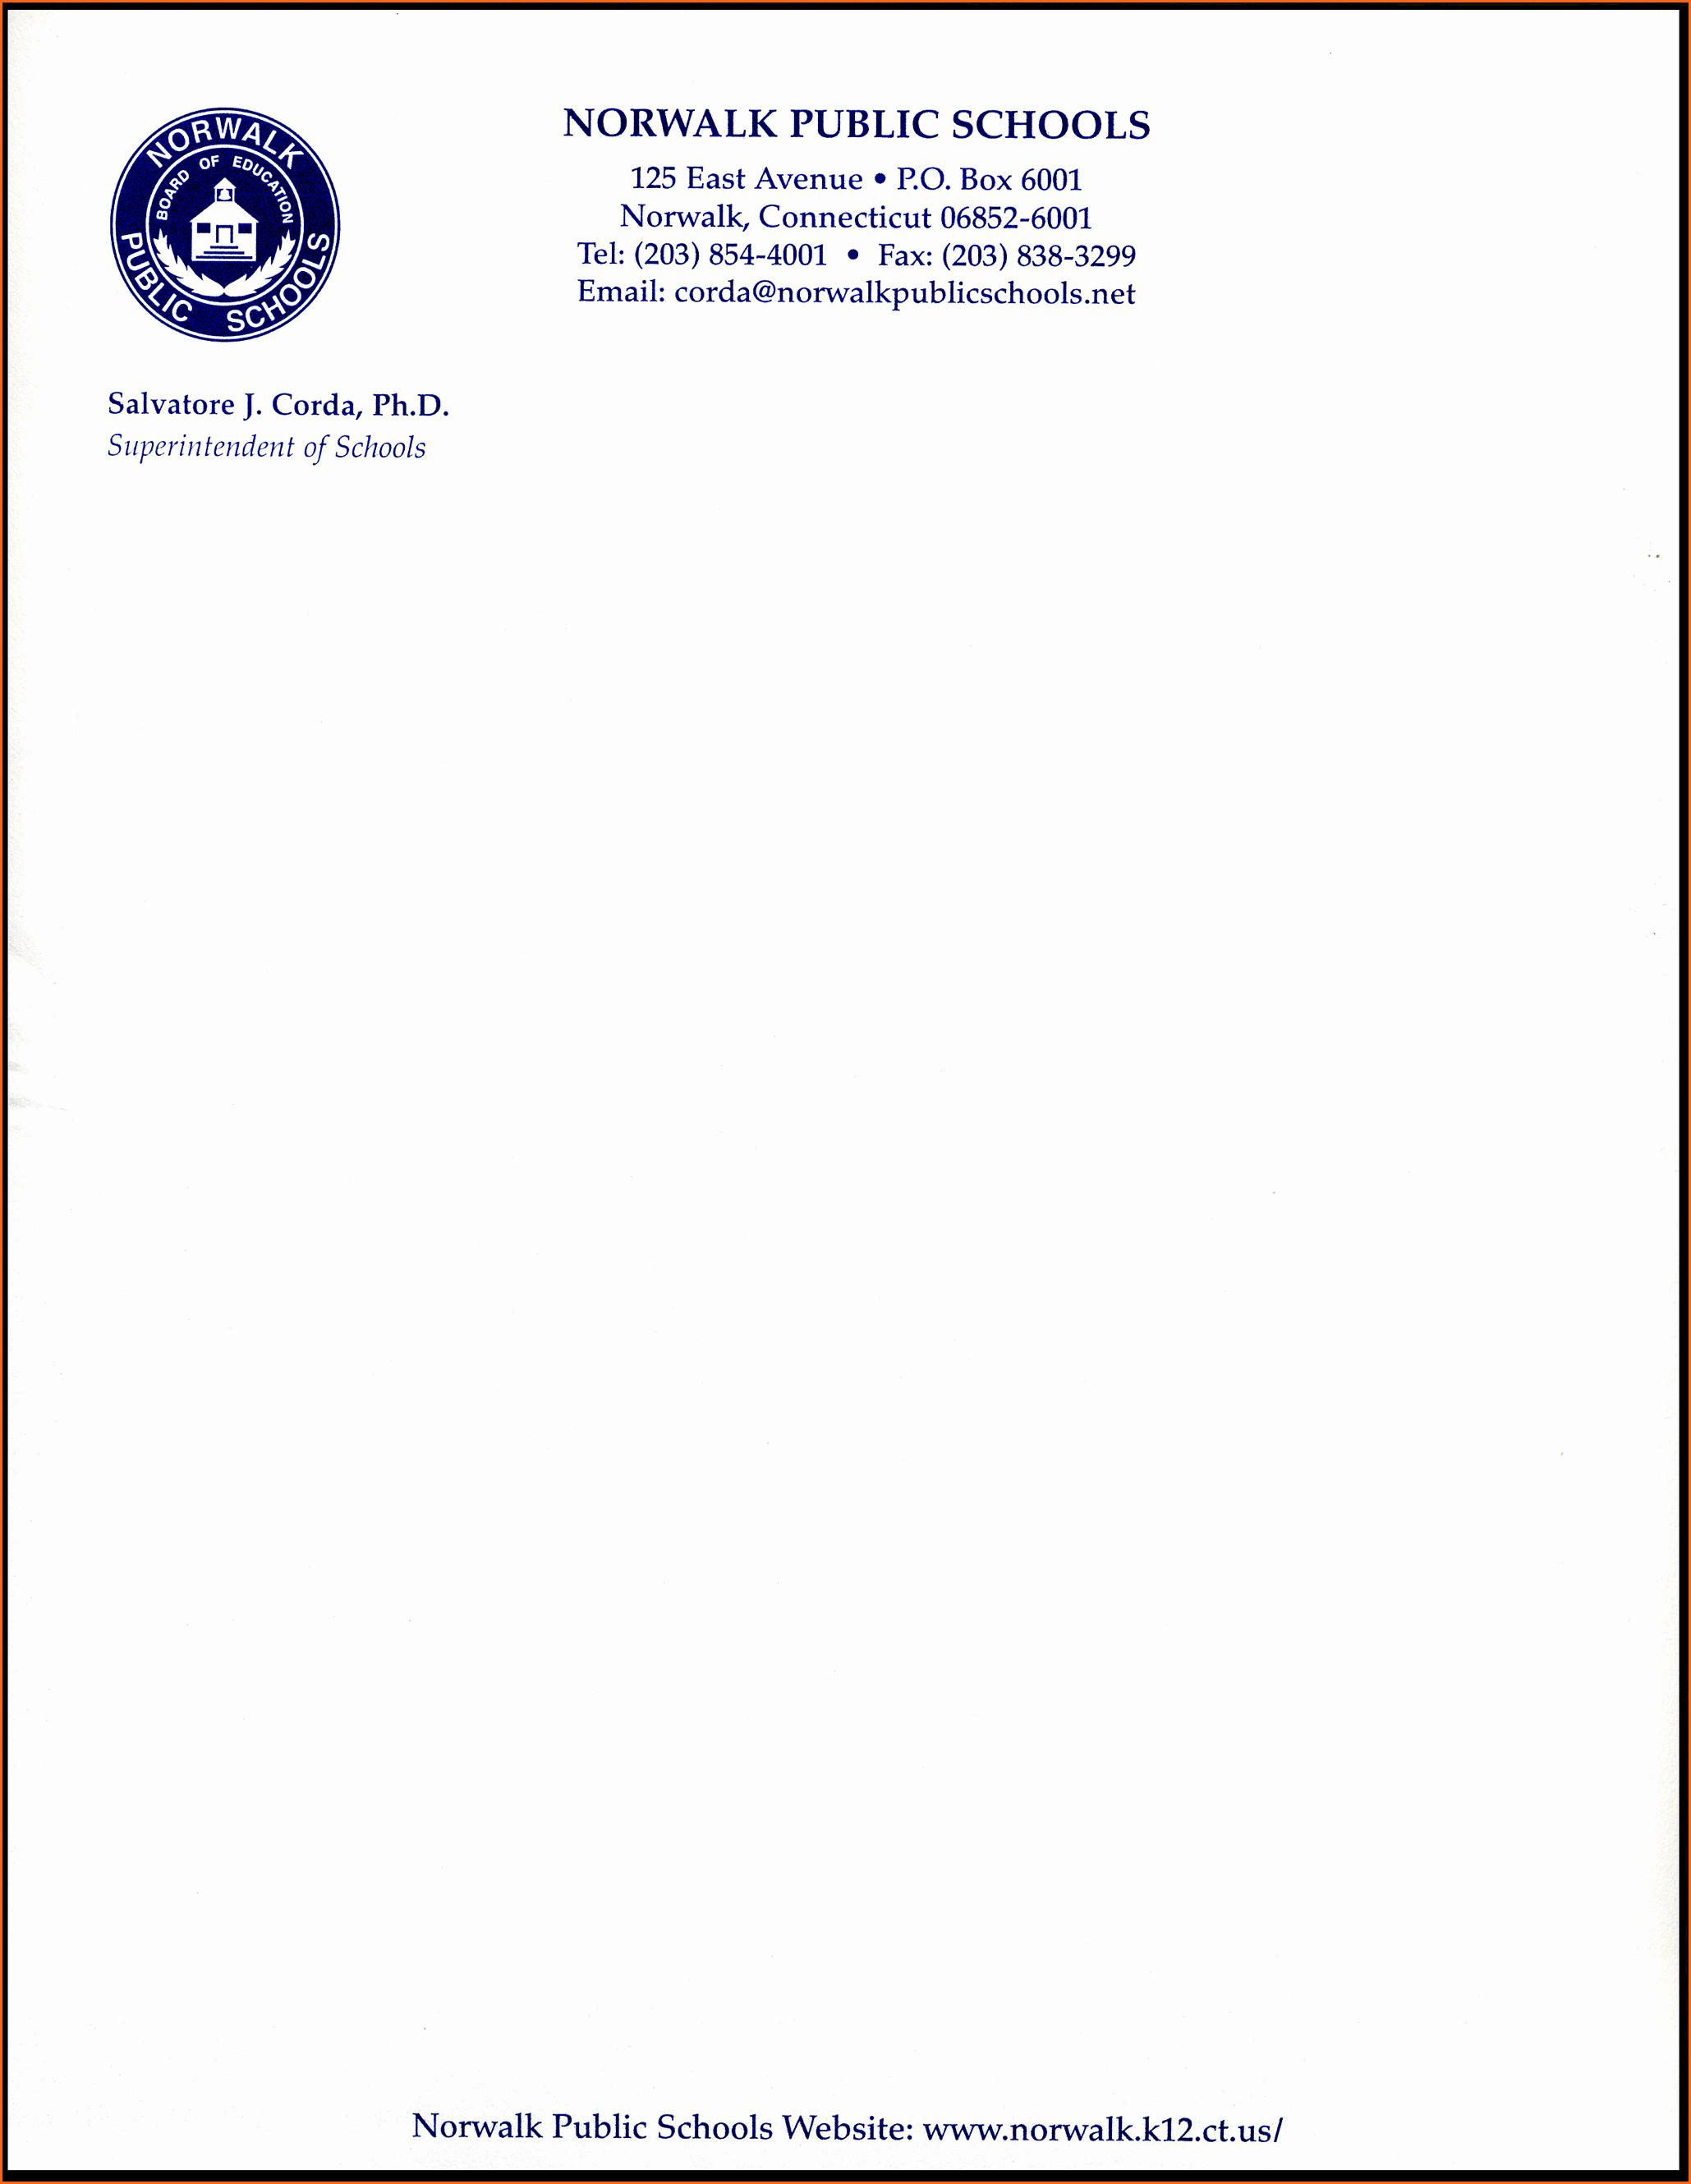 Sample Business Letter On Letterhead Beautiful Business Letterhead format Example Mughals